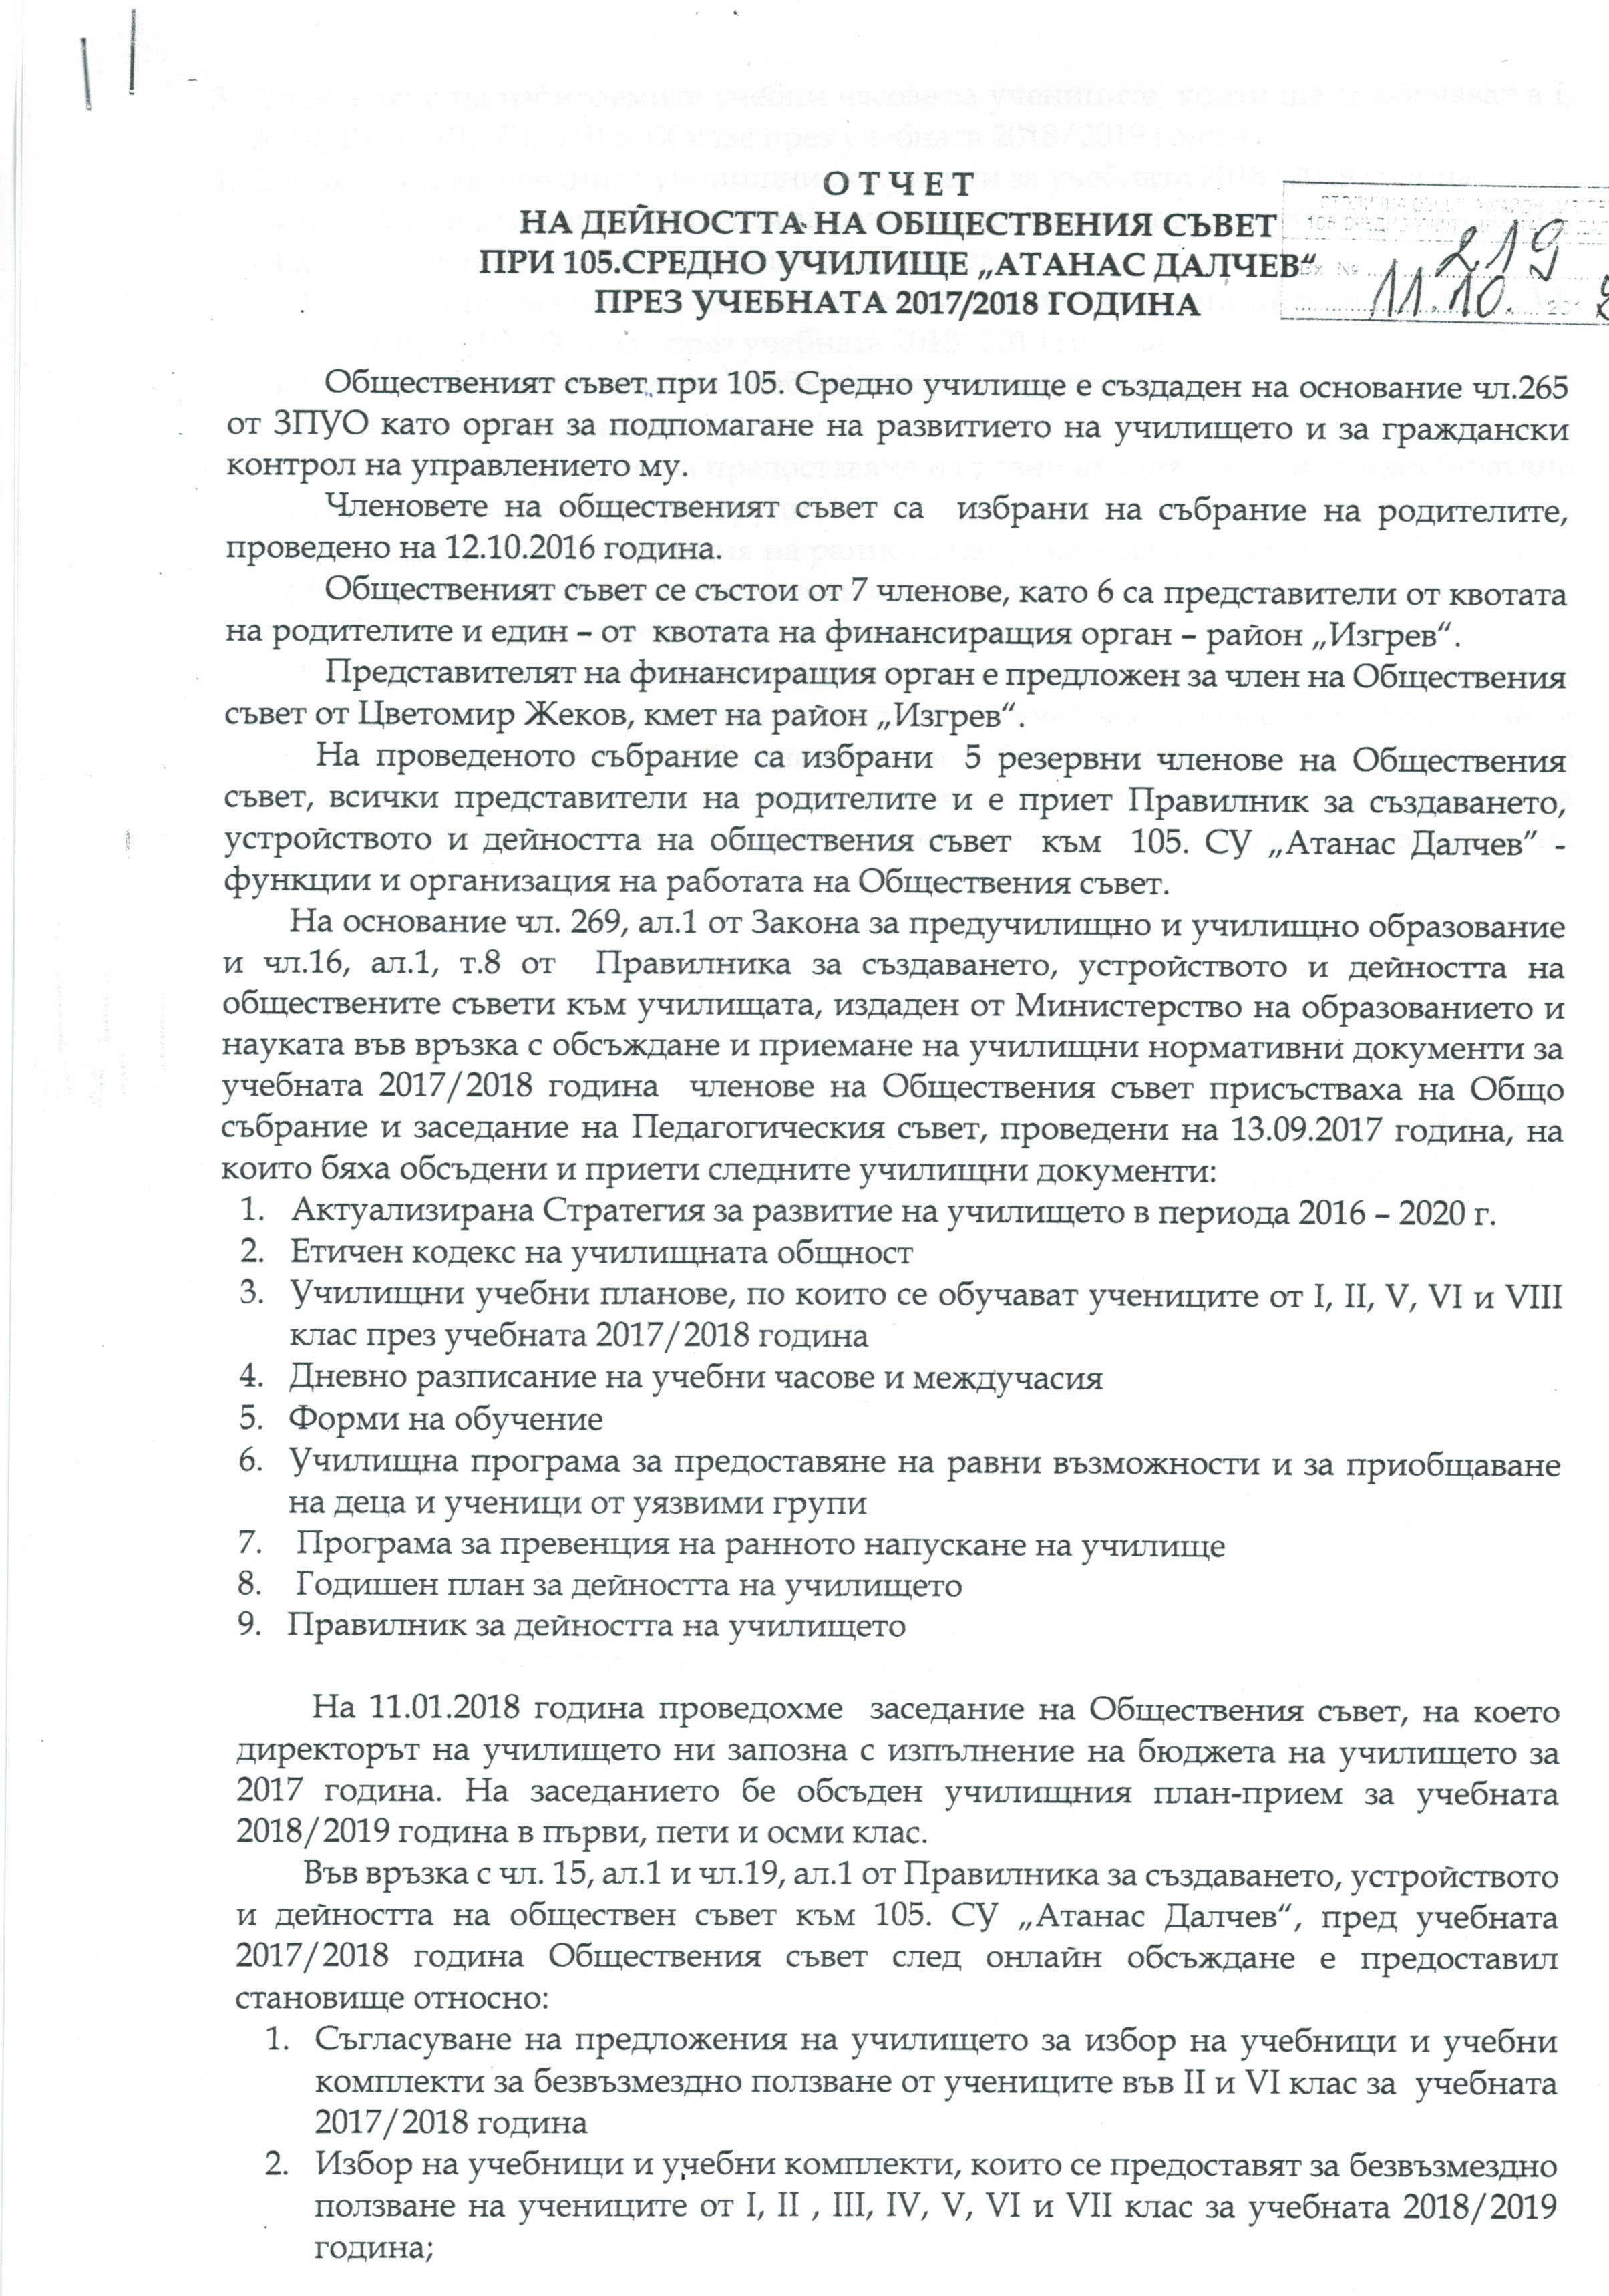 CCF11102018_00003